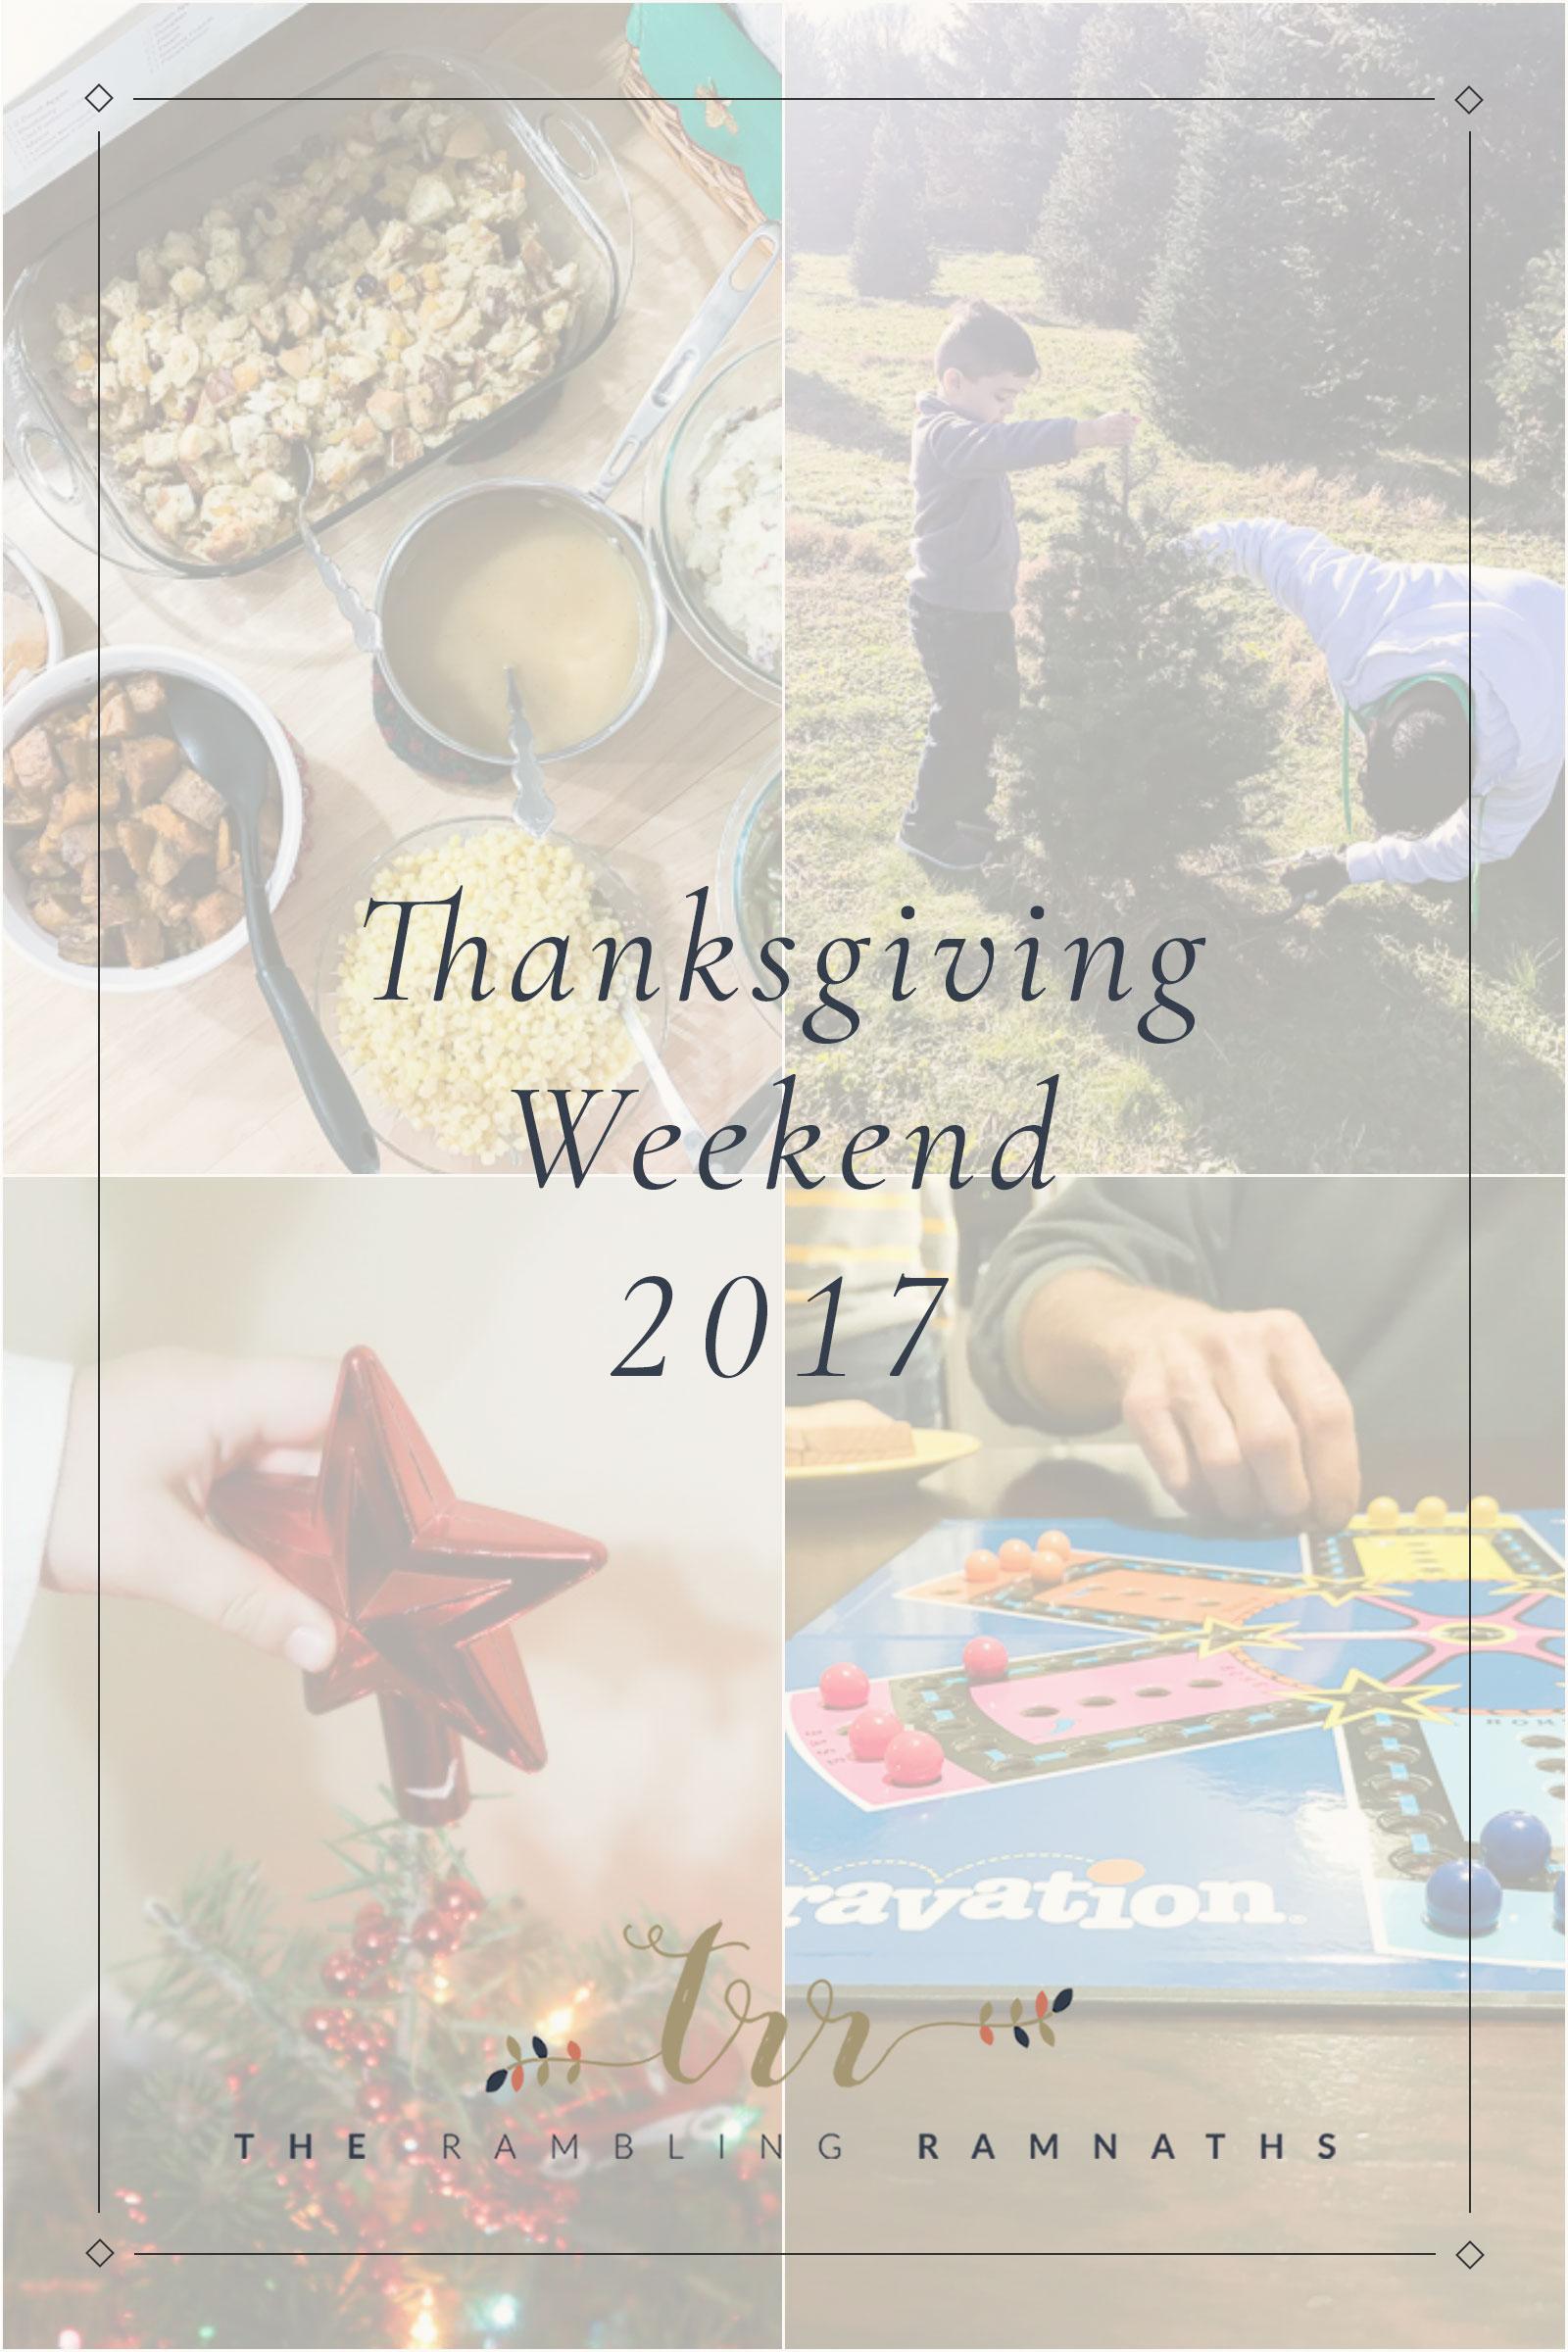 Thanksgiving Weekend 2017